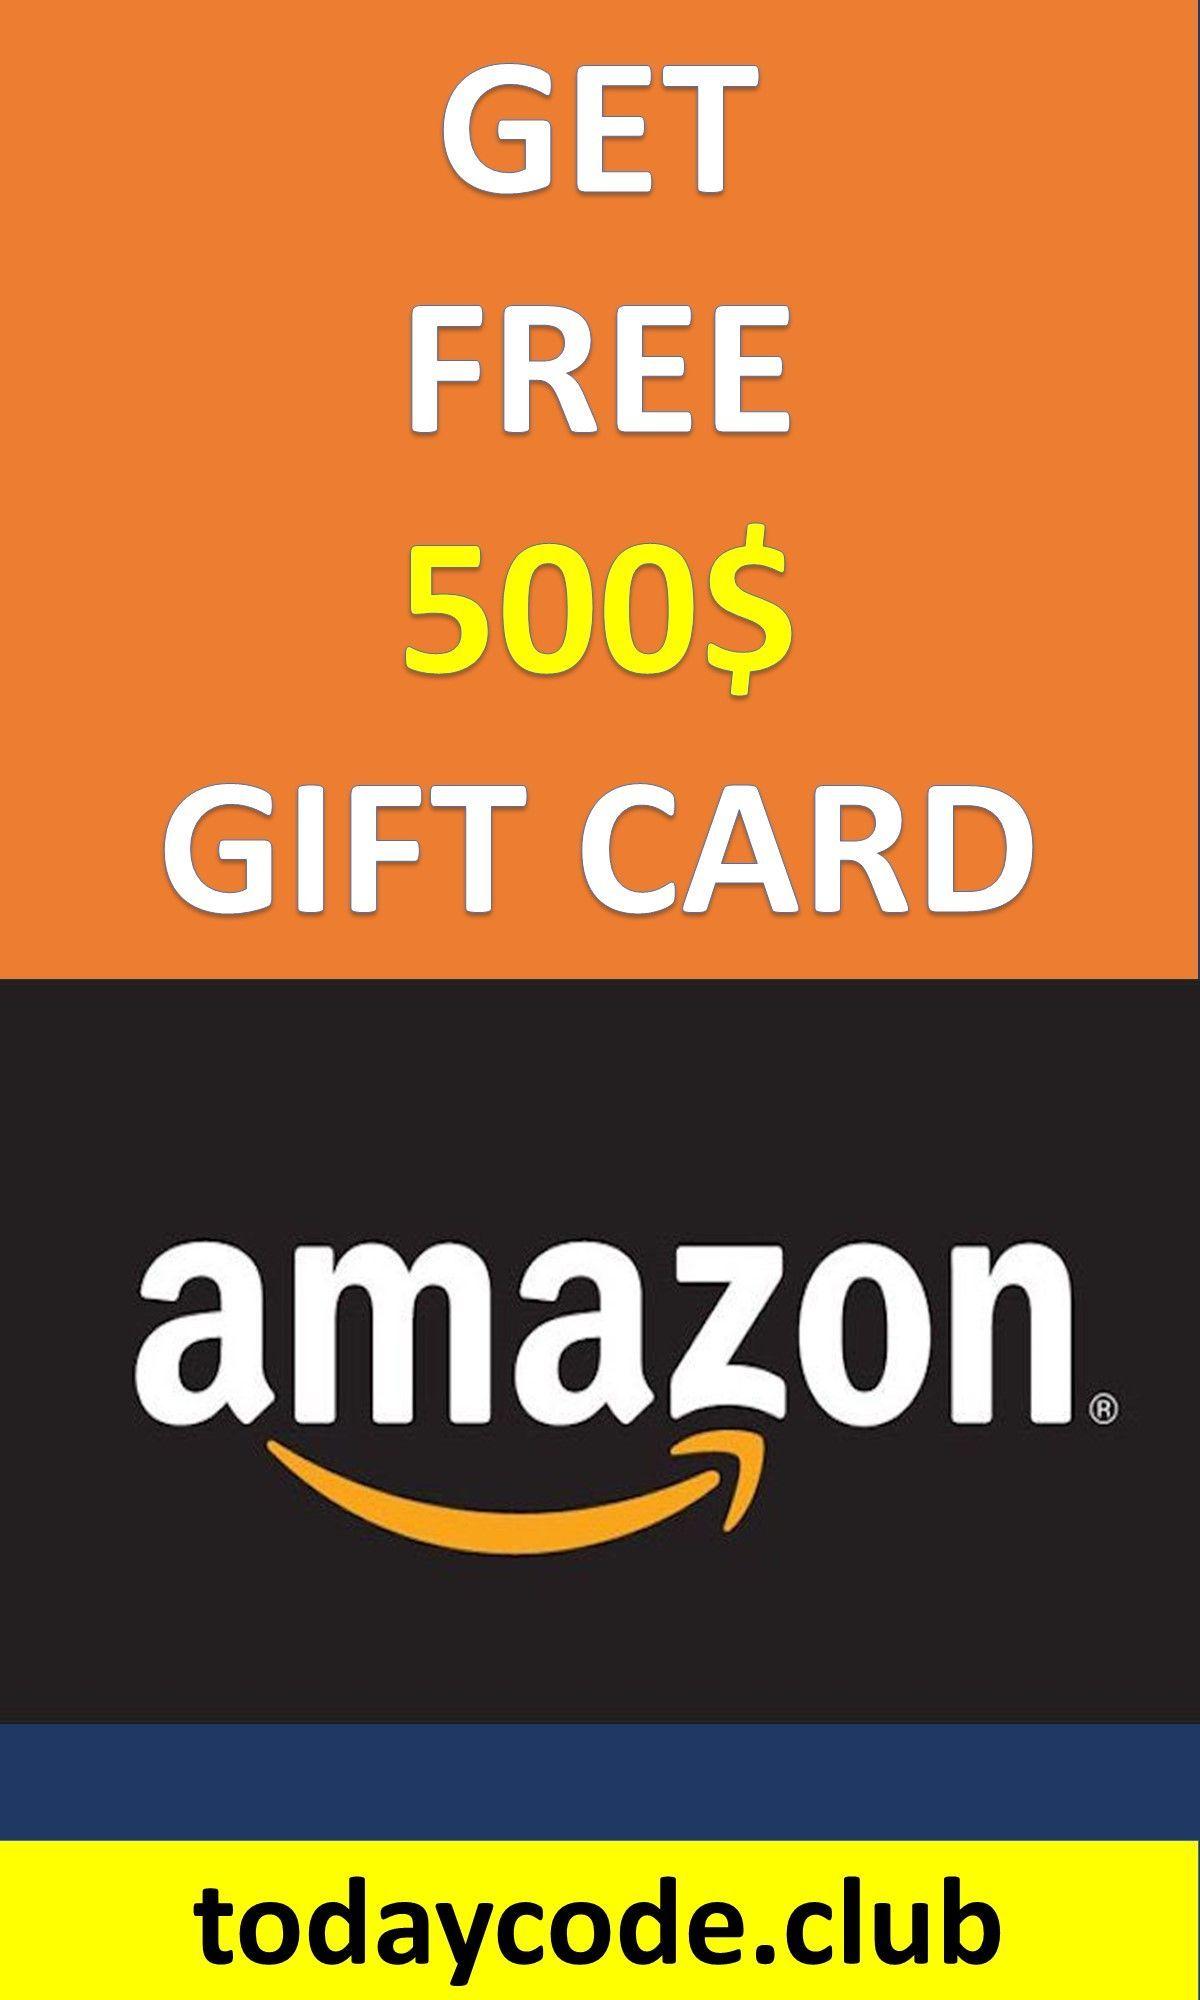 How To Get Free Amazon Gift Card Amazon Gift Card Free Free Gift Card Generator Free Amazon Products